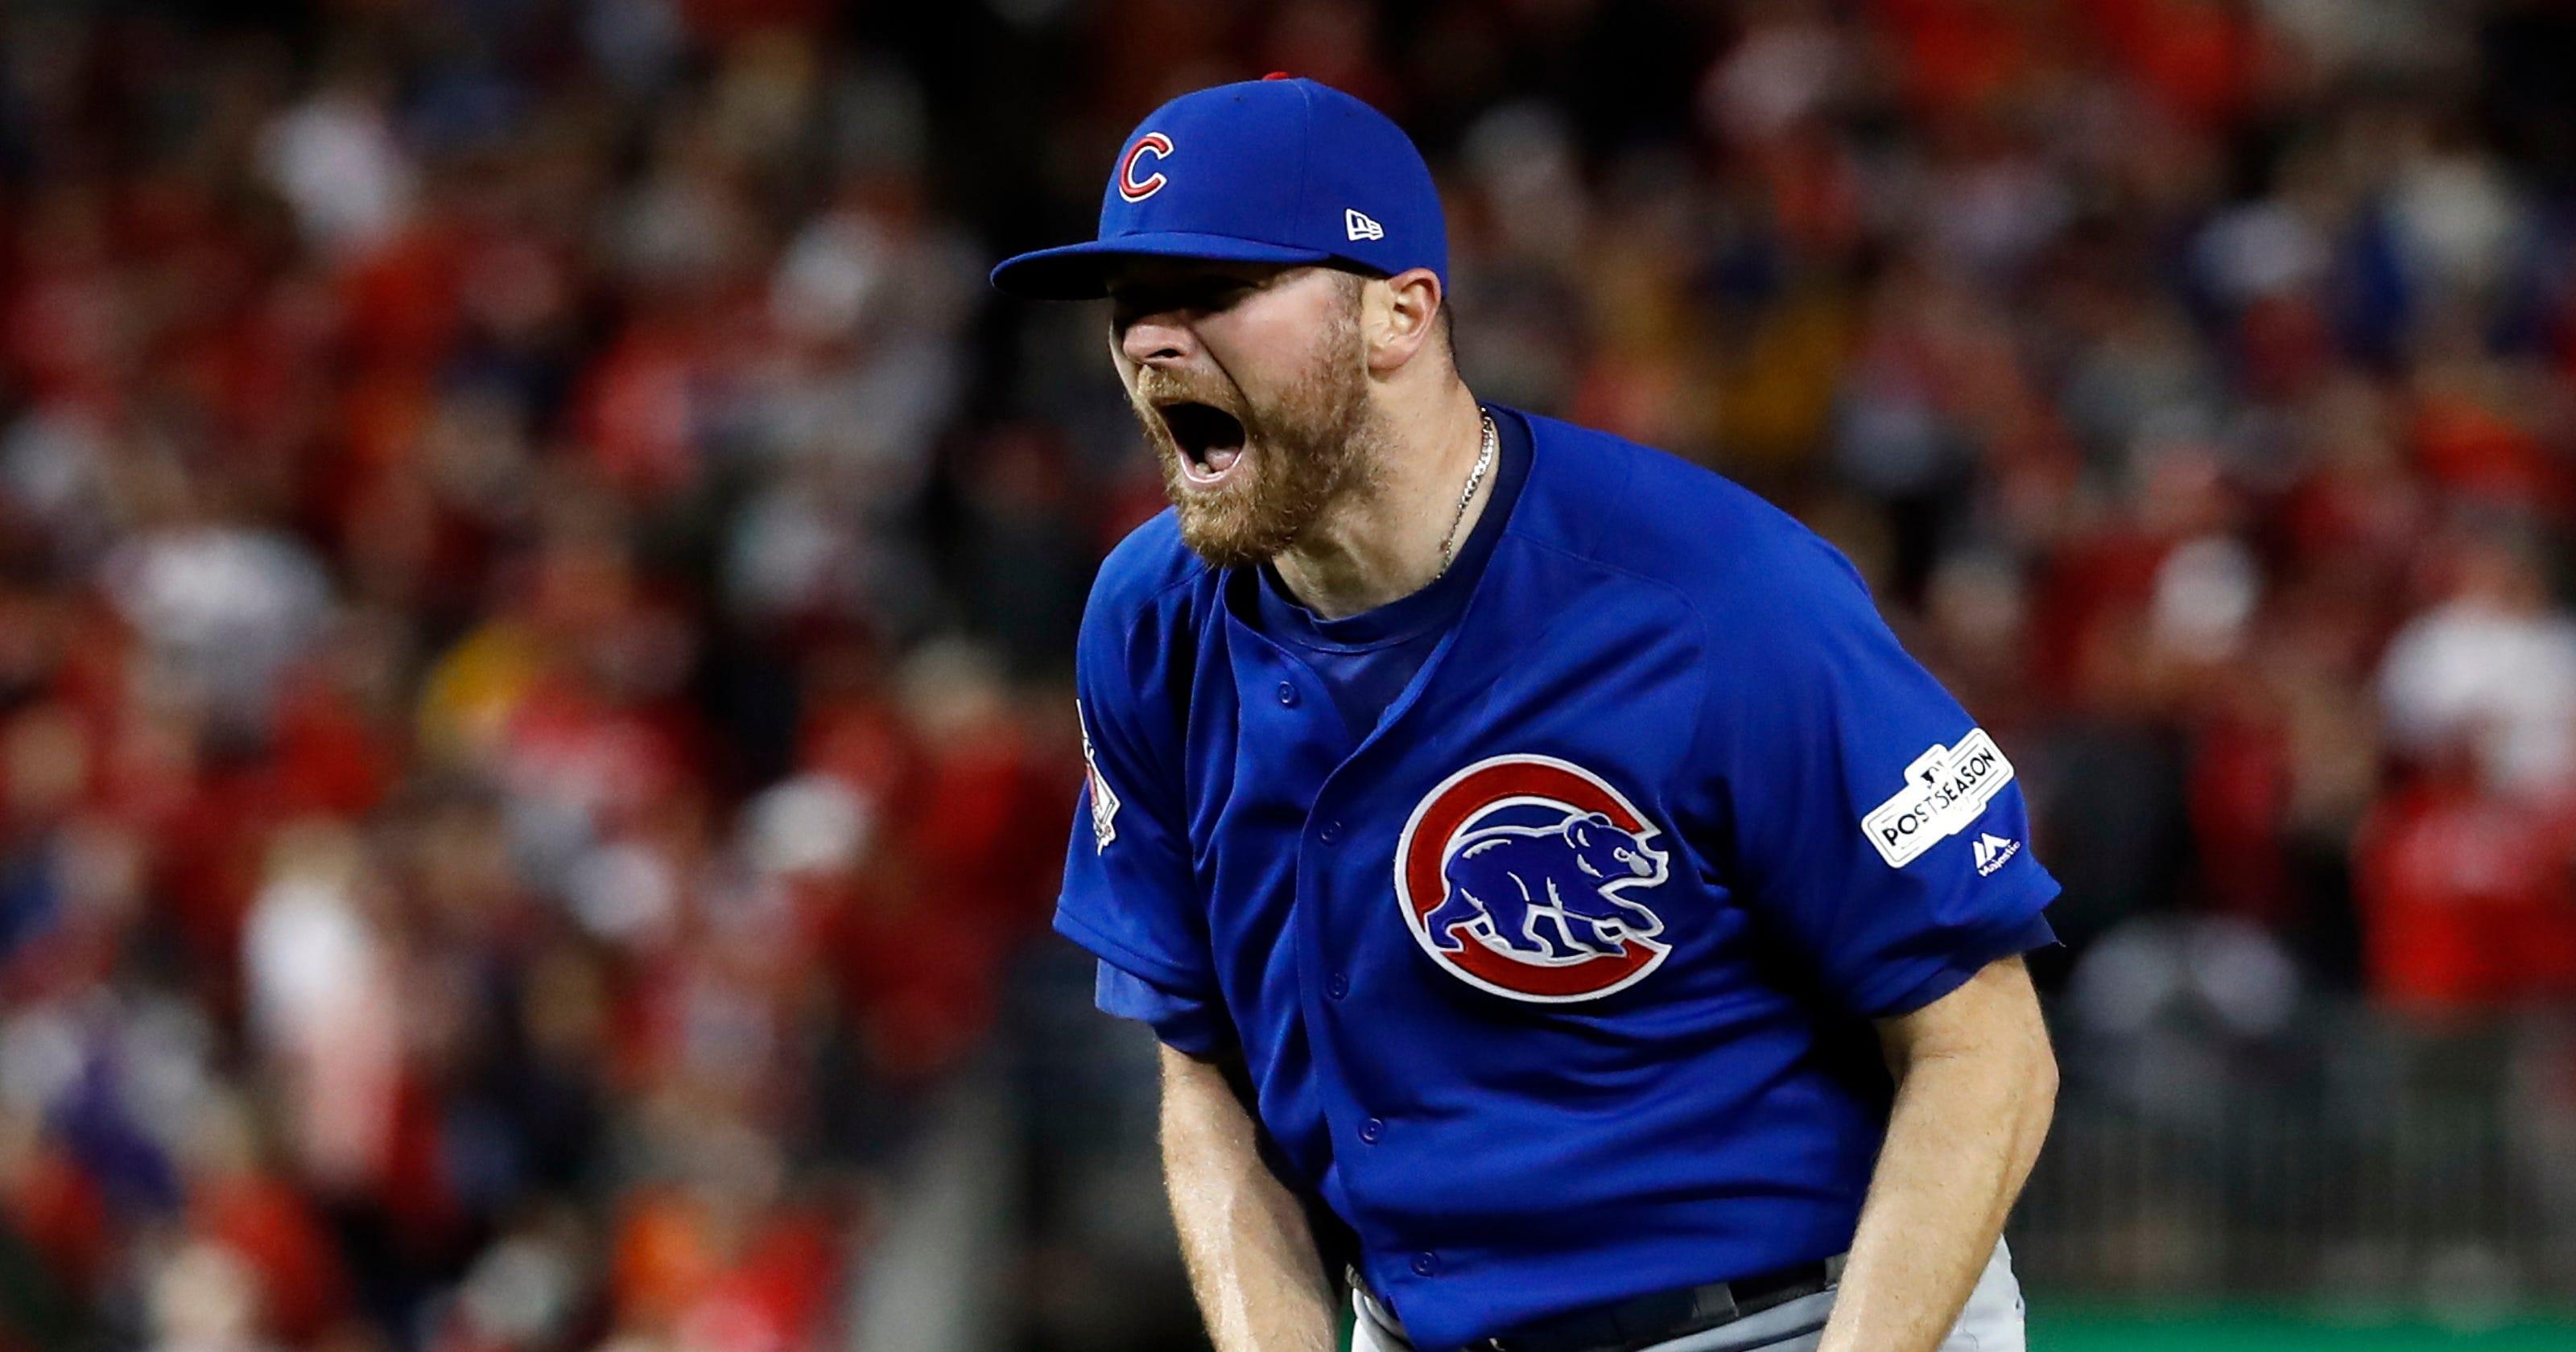 Cubs get last laugh  Absurd 9-8 win over Nationals 094aaf5f11c